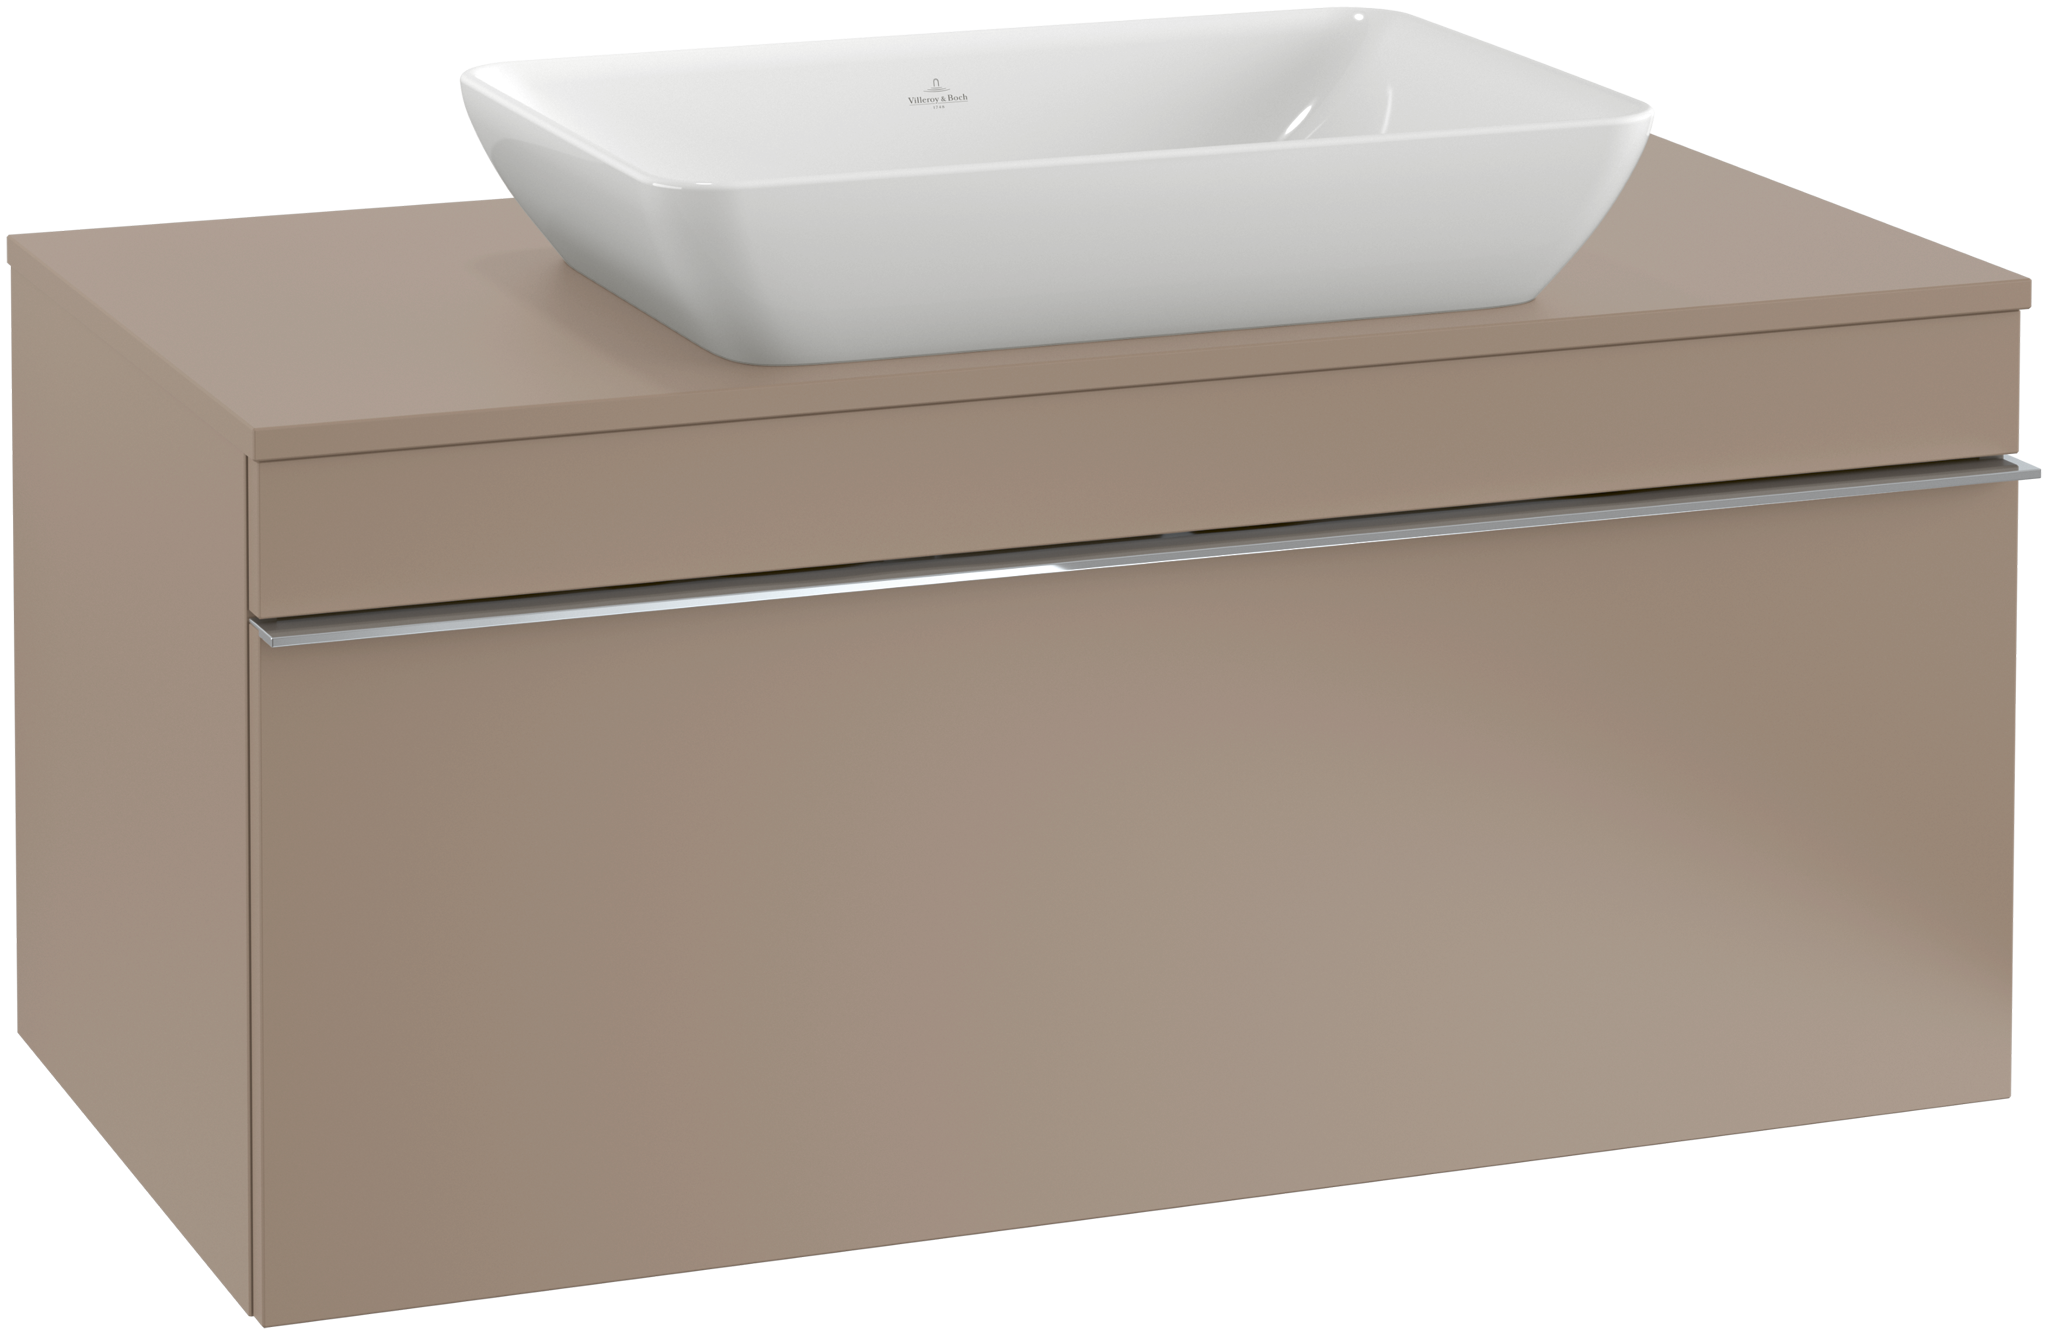 venticello waschtischunterschrank a94501 villeroy boch. Black Bedroom Furniture Sets. Home Design Ideas